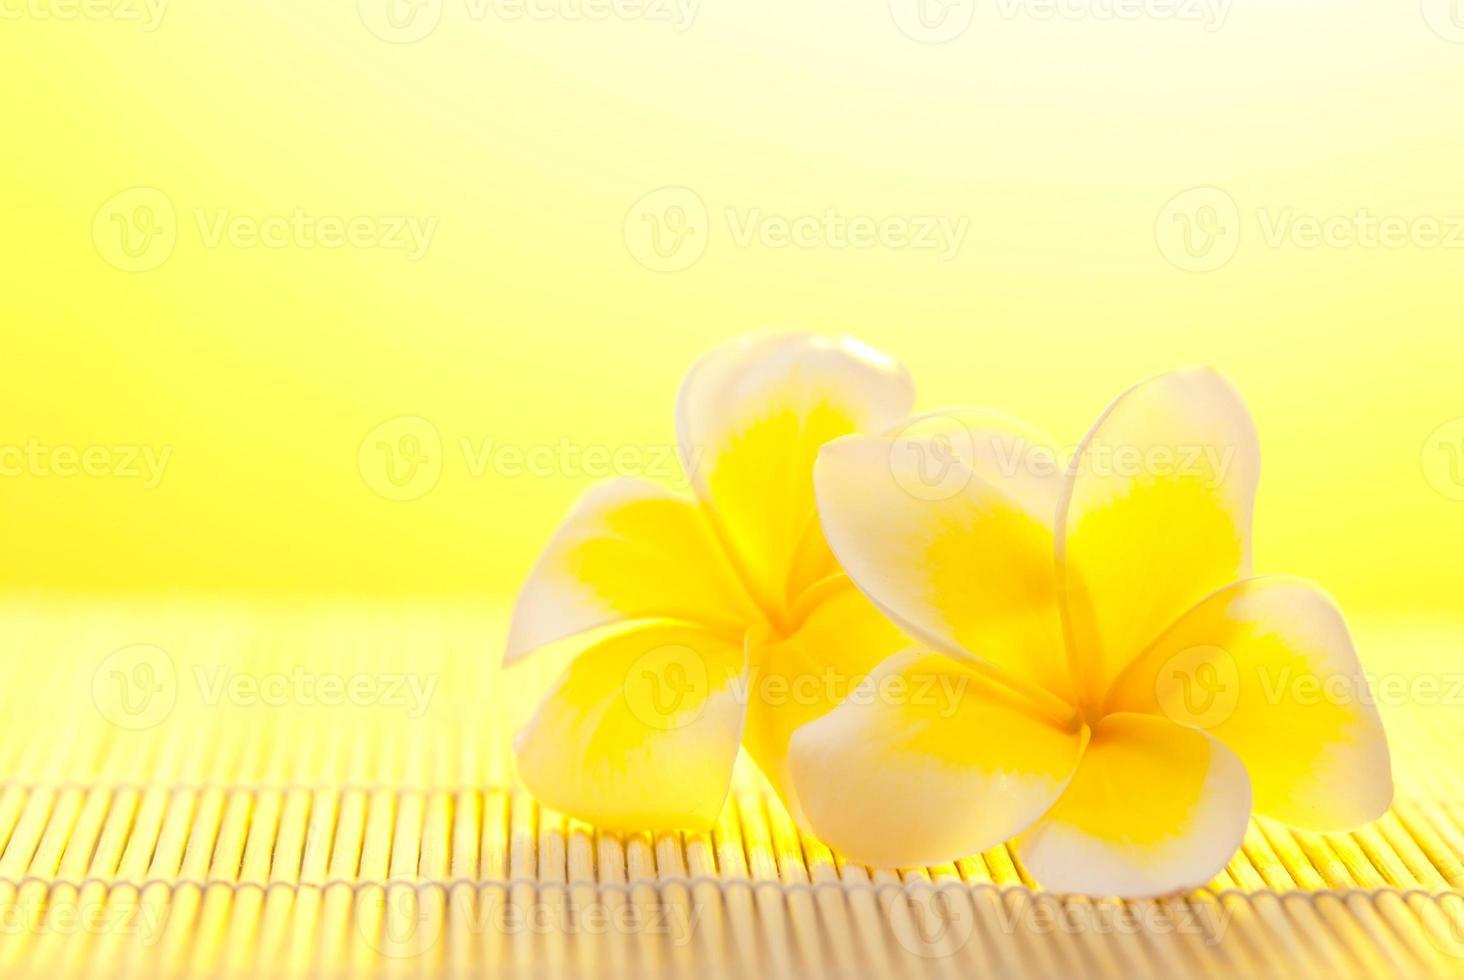 Leelawadee-Blume auf Bambushintergrund foto